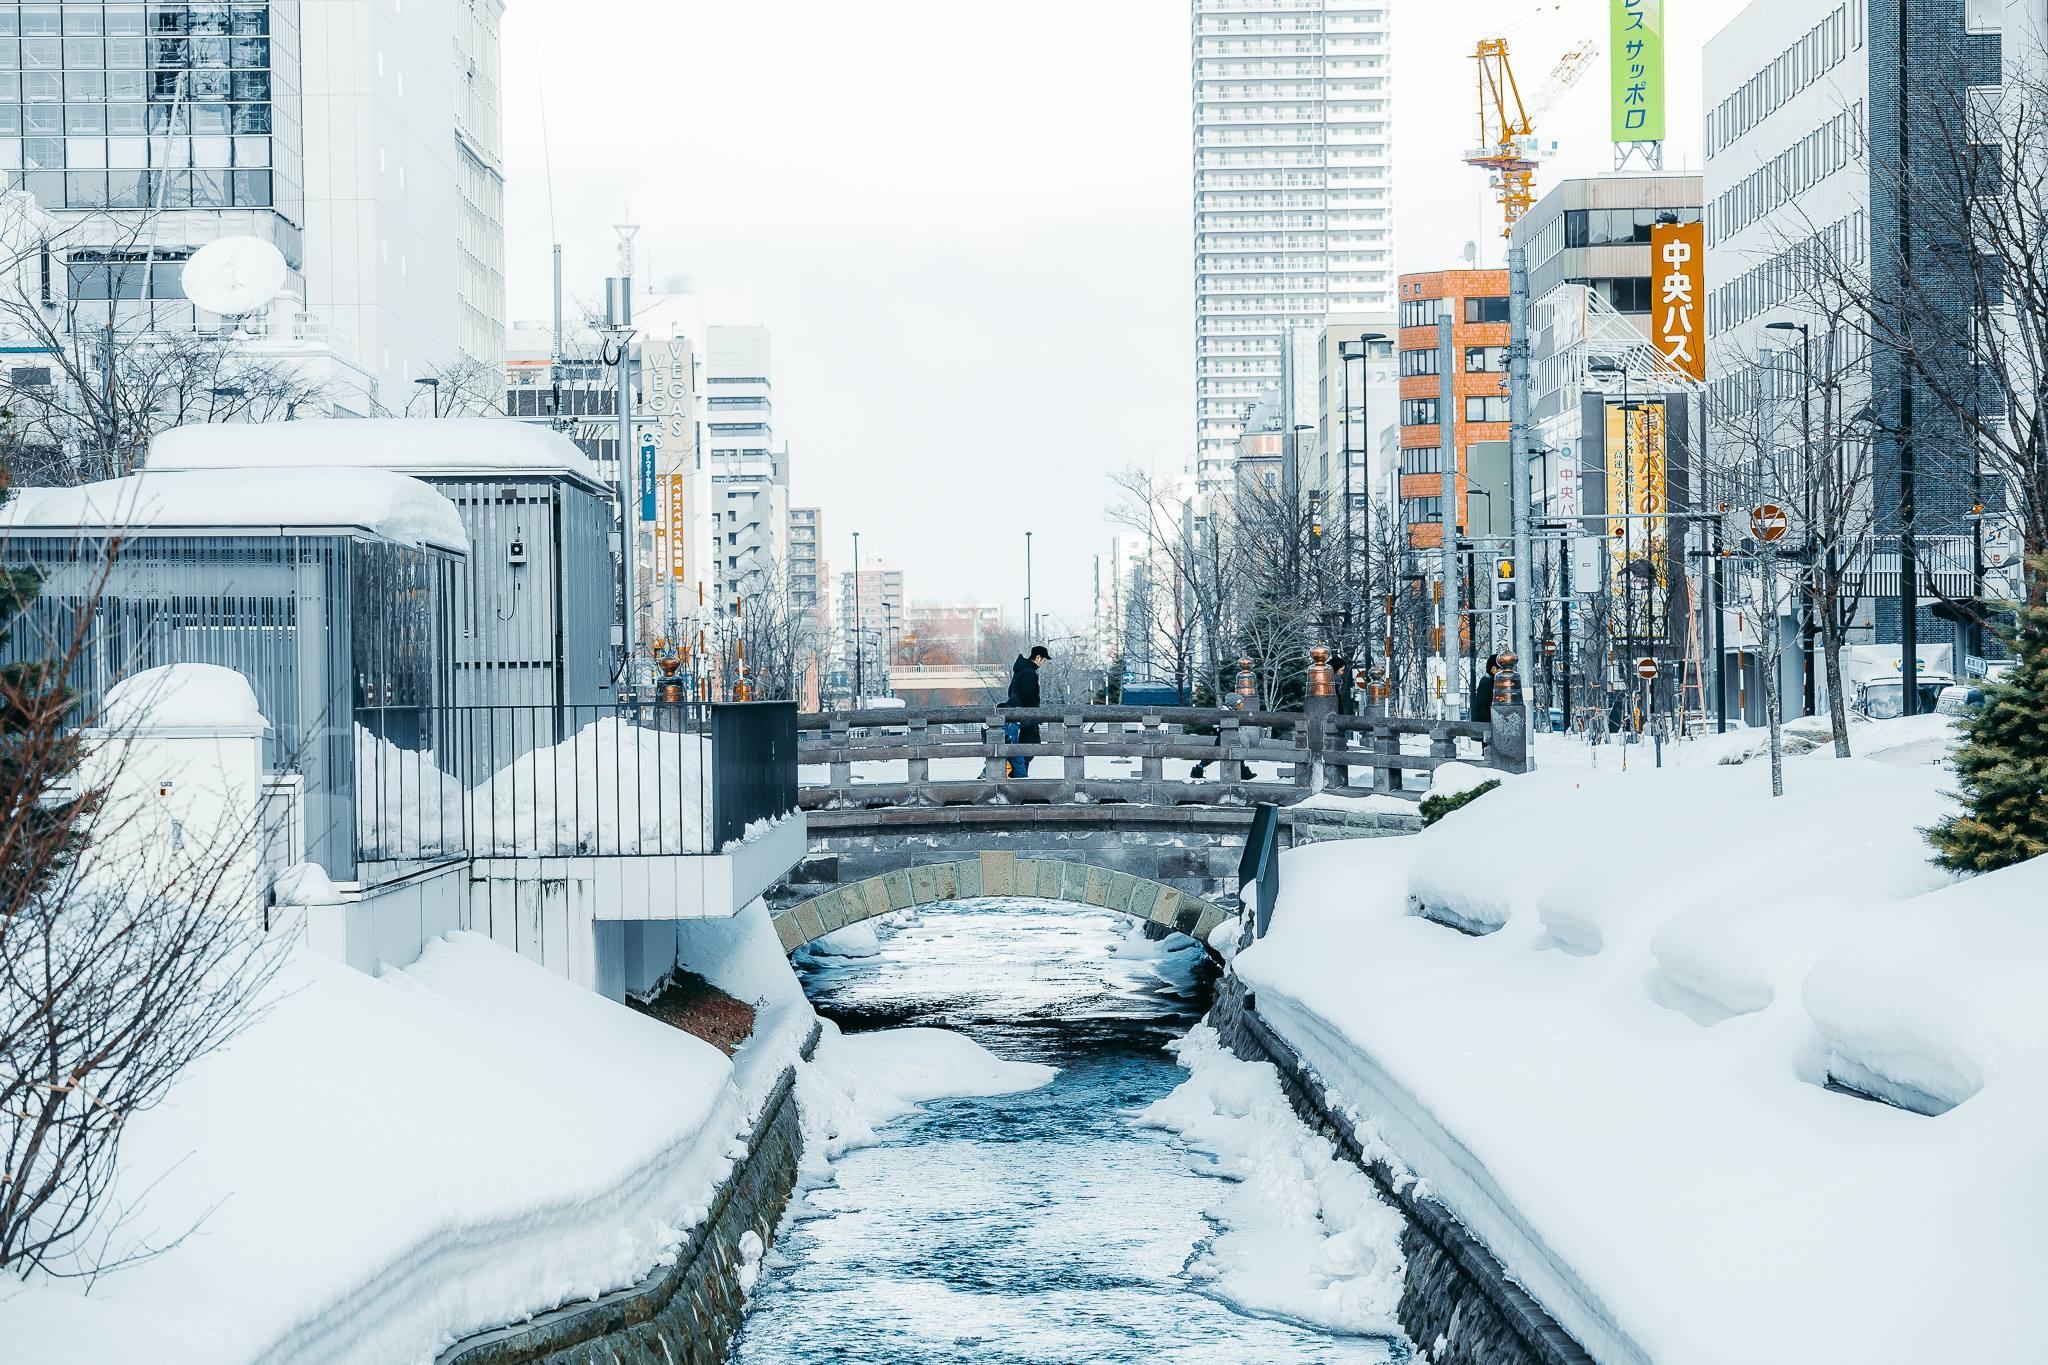 Hokkaido tuyet trang, noi dang den nhat mua dong o Nhat Ban hinh anh 29